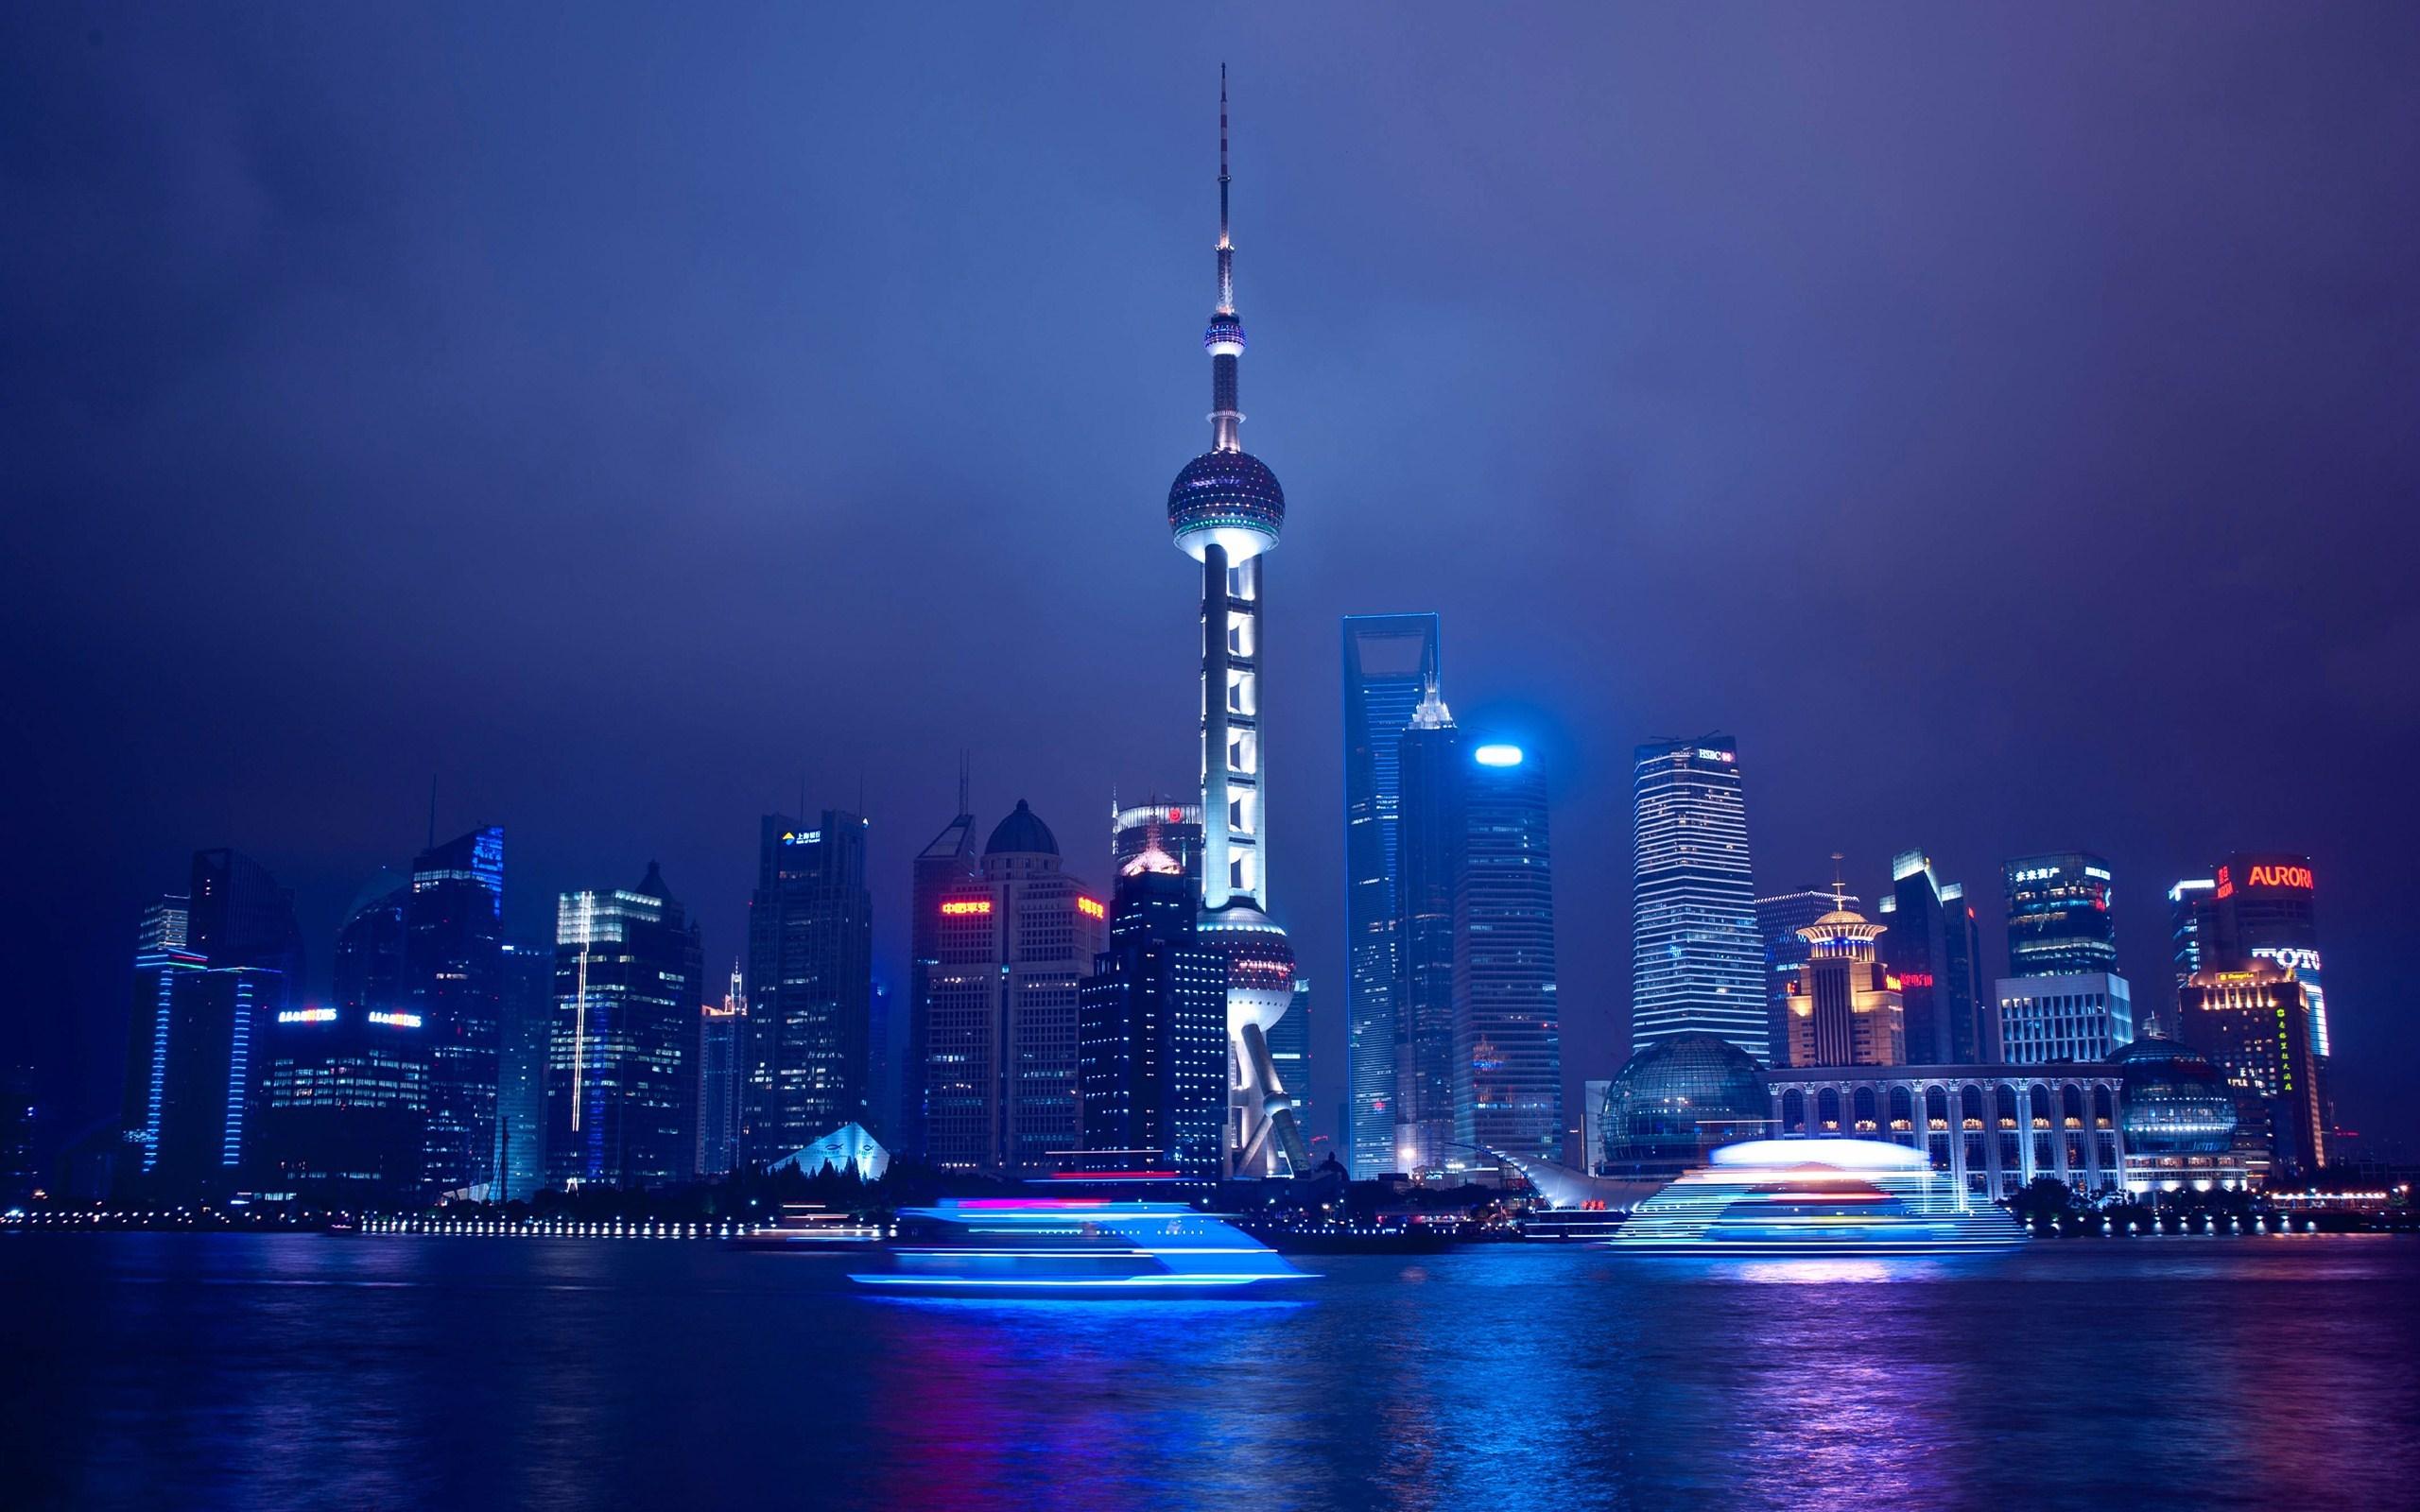 Shanghai China City The Oriental Pearl Tower Blue Sea Night HD Wallpaper